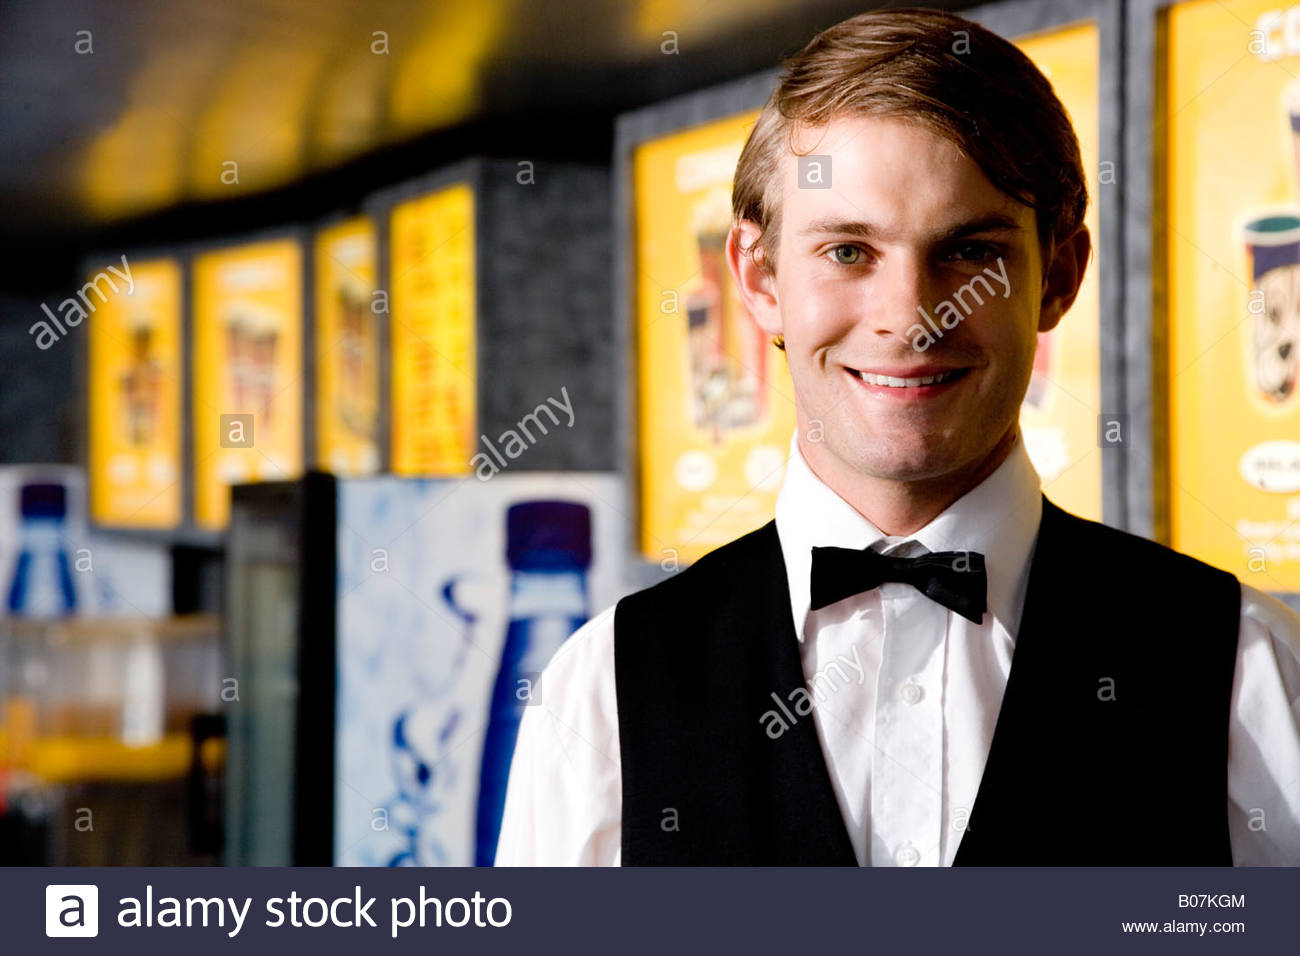 Elegantemente vestito usher al cinema sorridente Immagini Stock